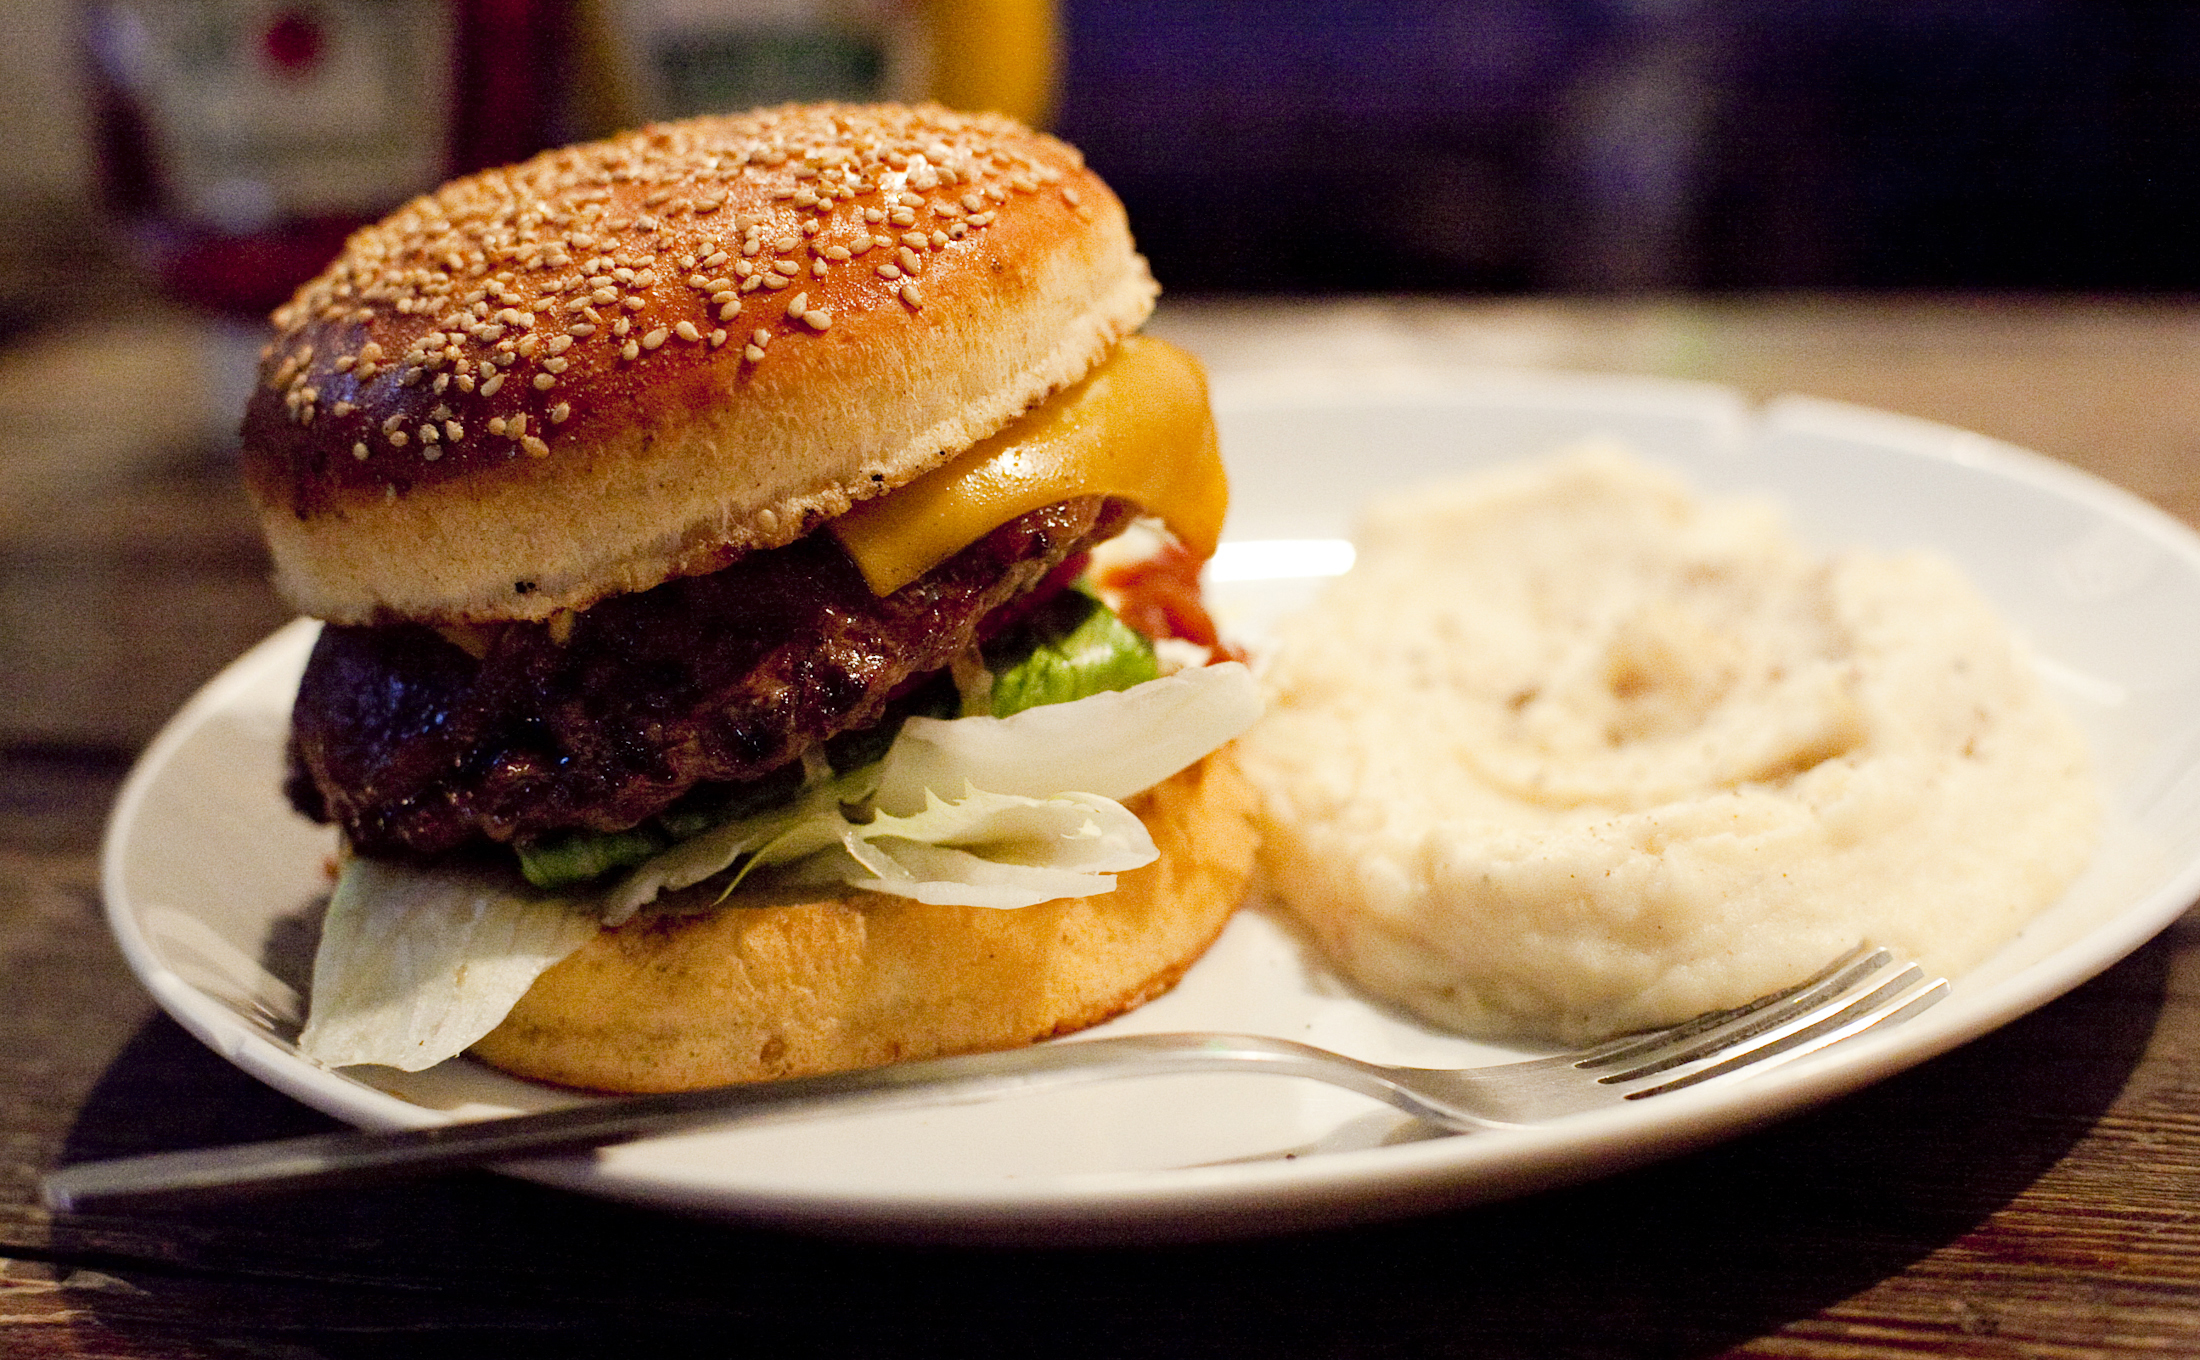 W.P Gold Burger